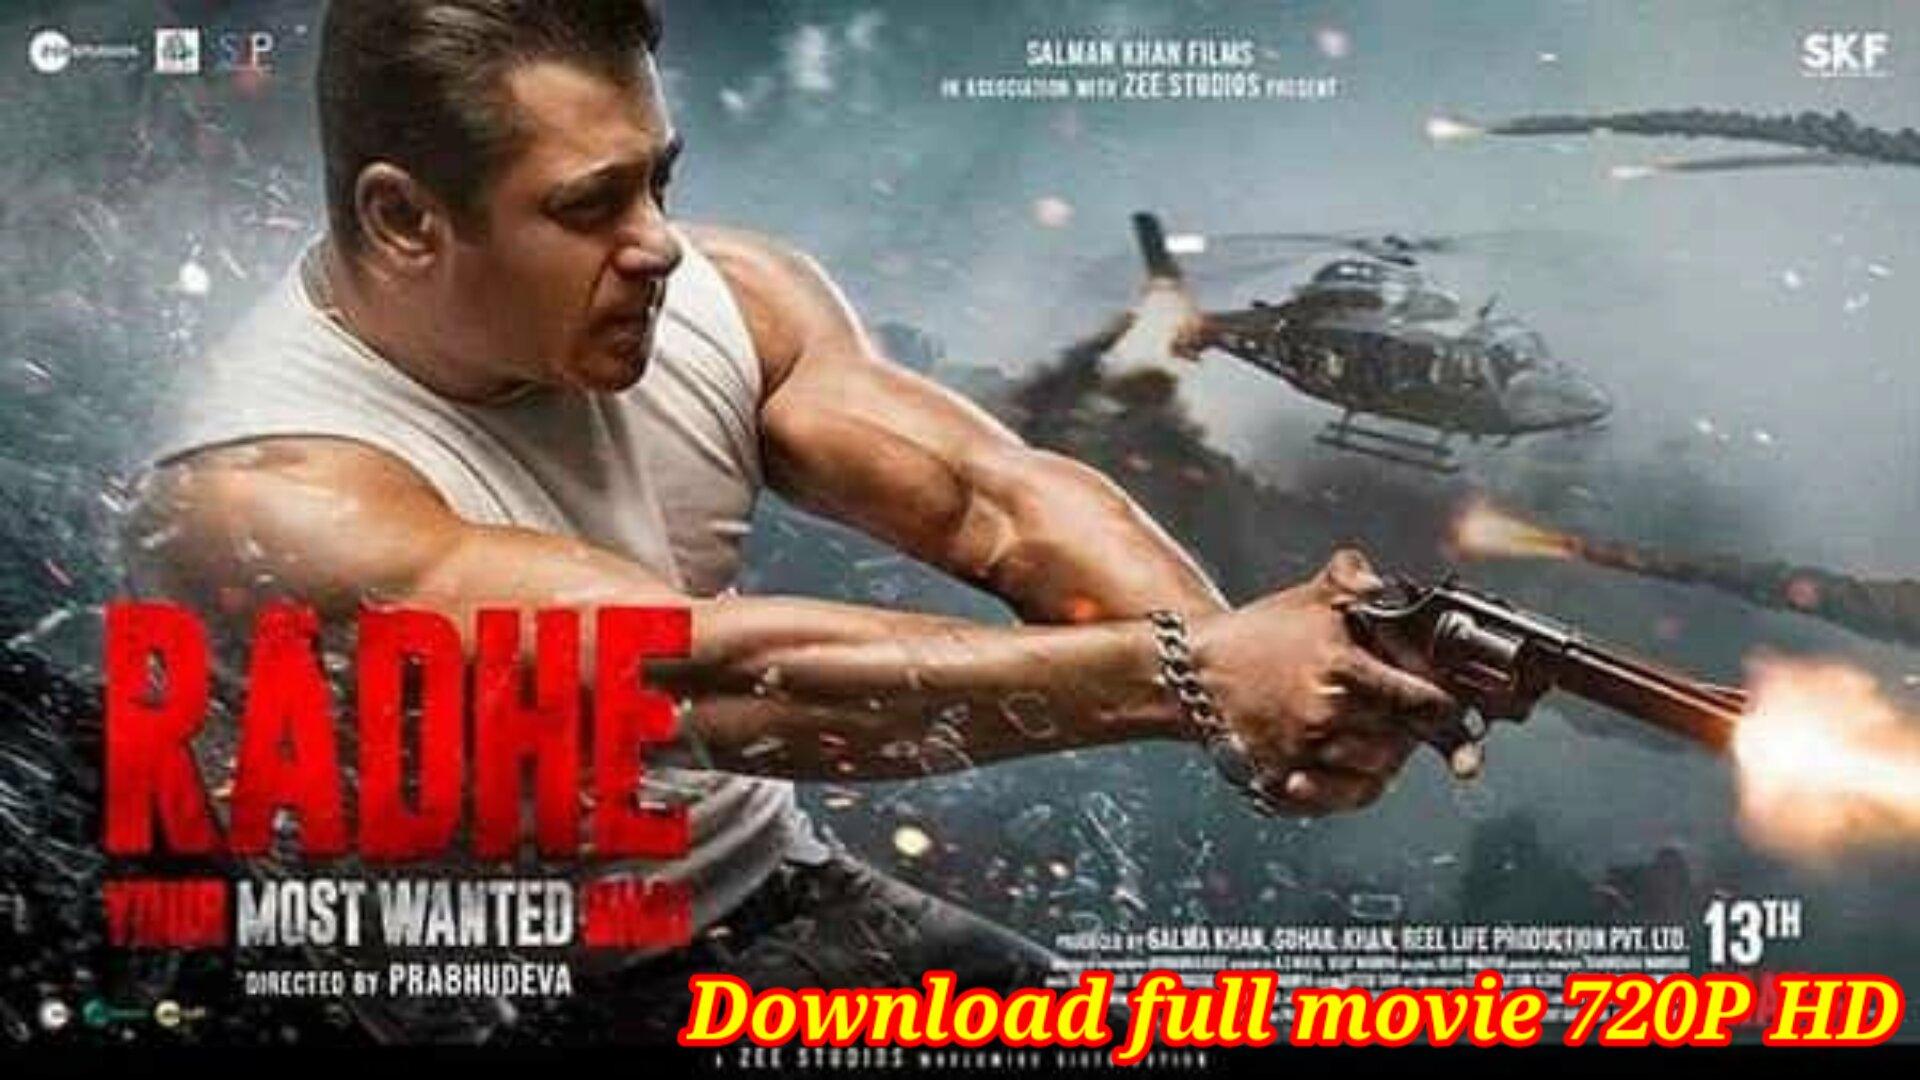 Radhe (2021 film) full Movie Download